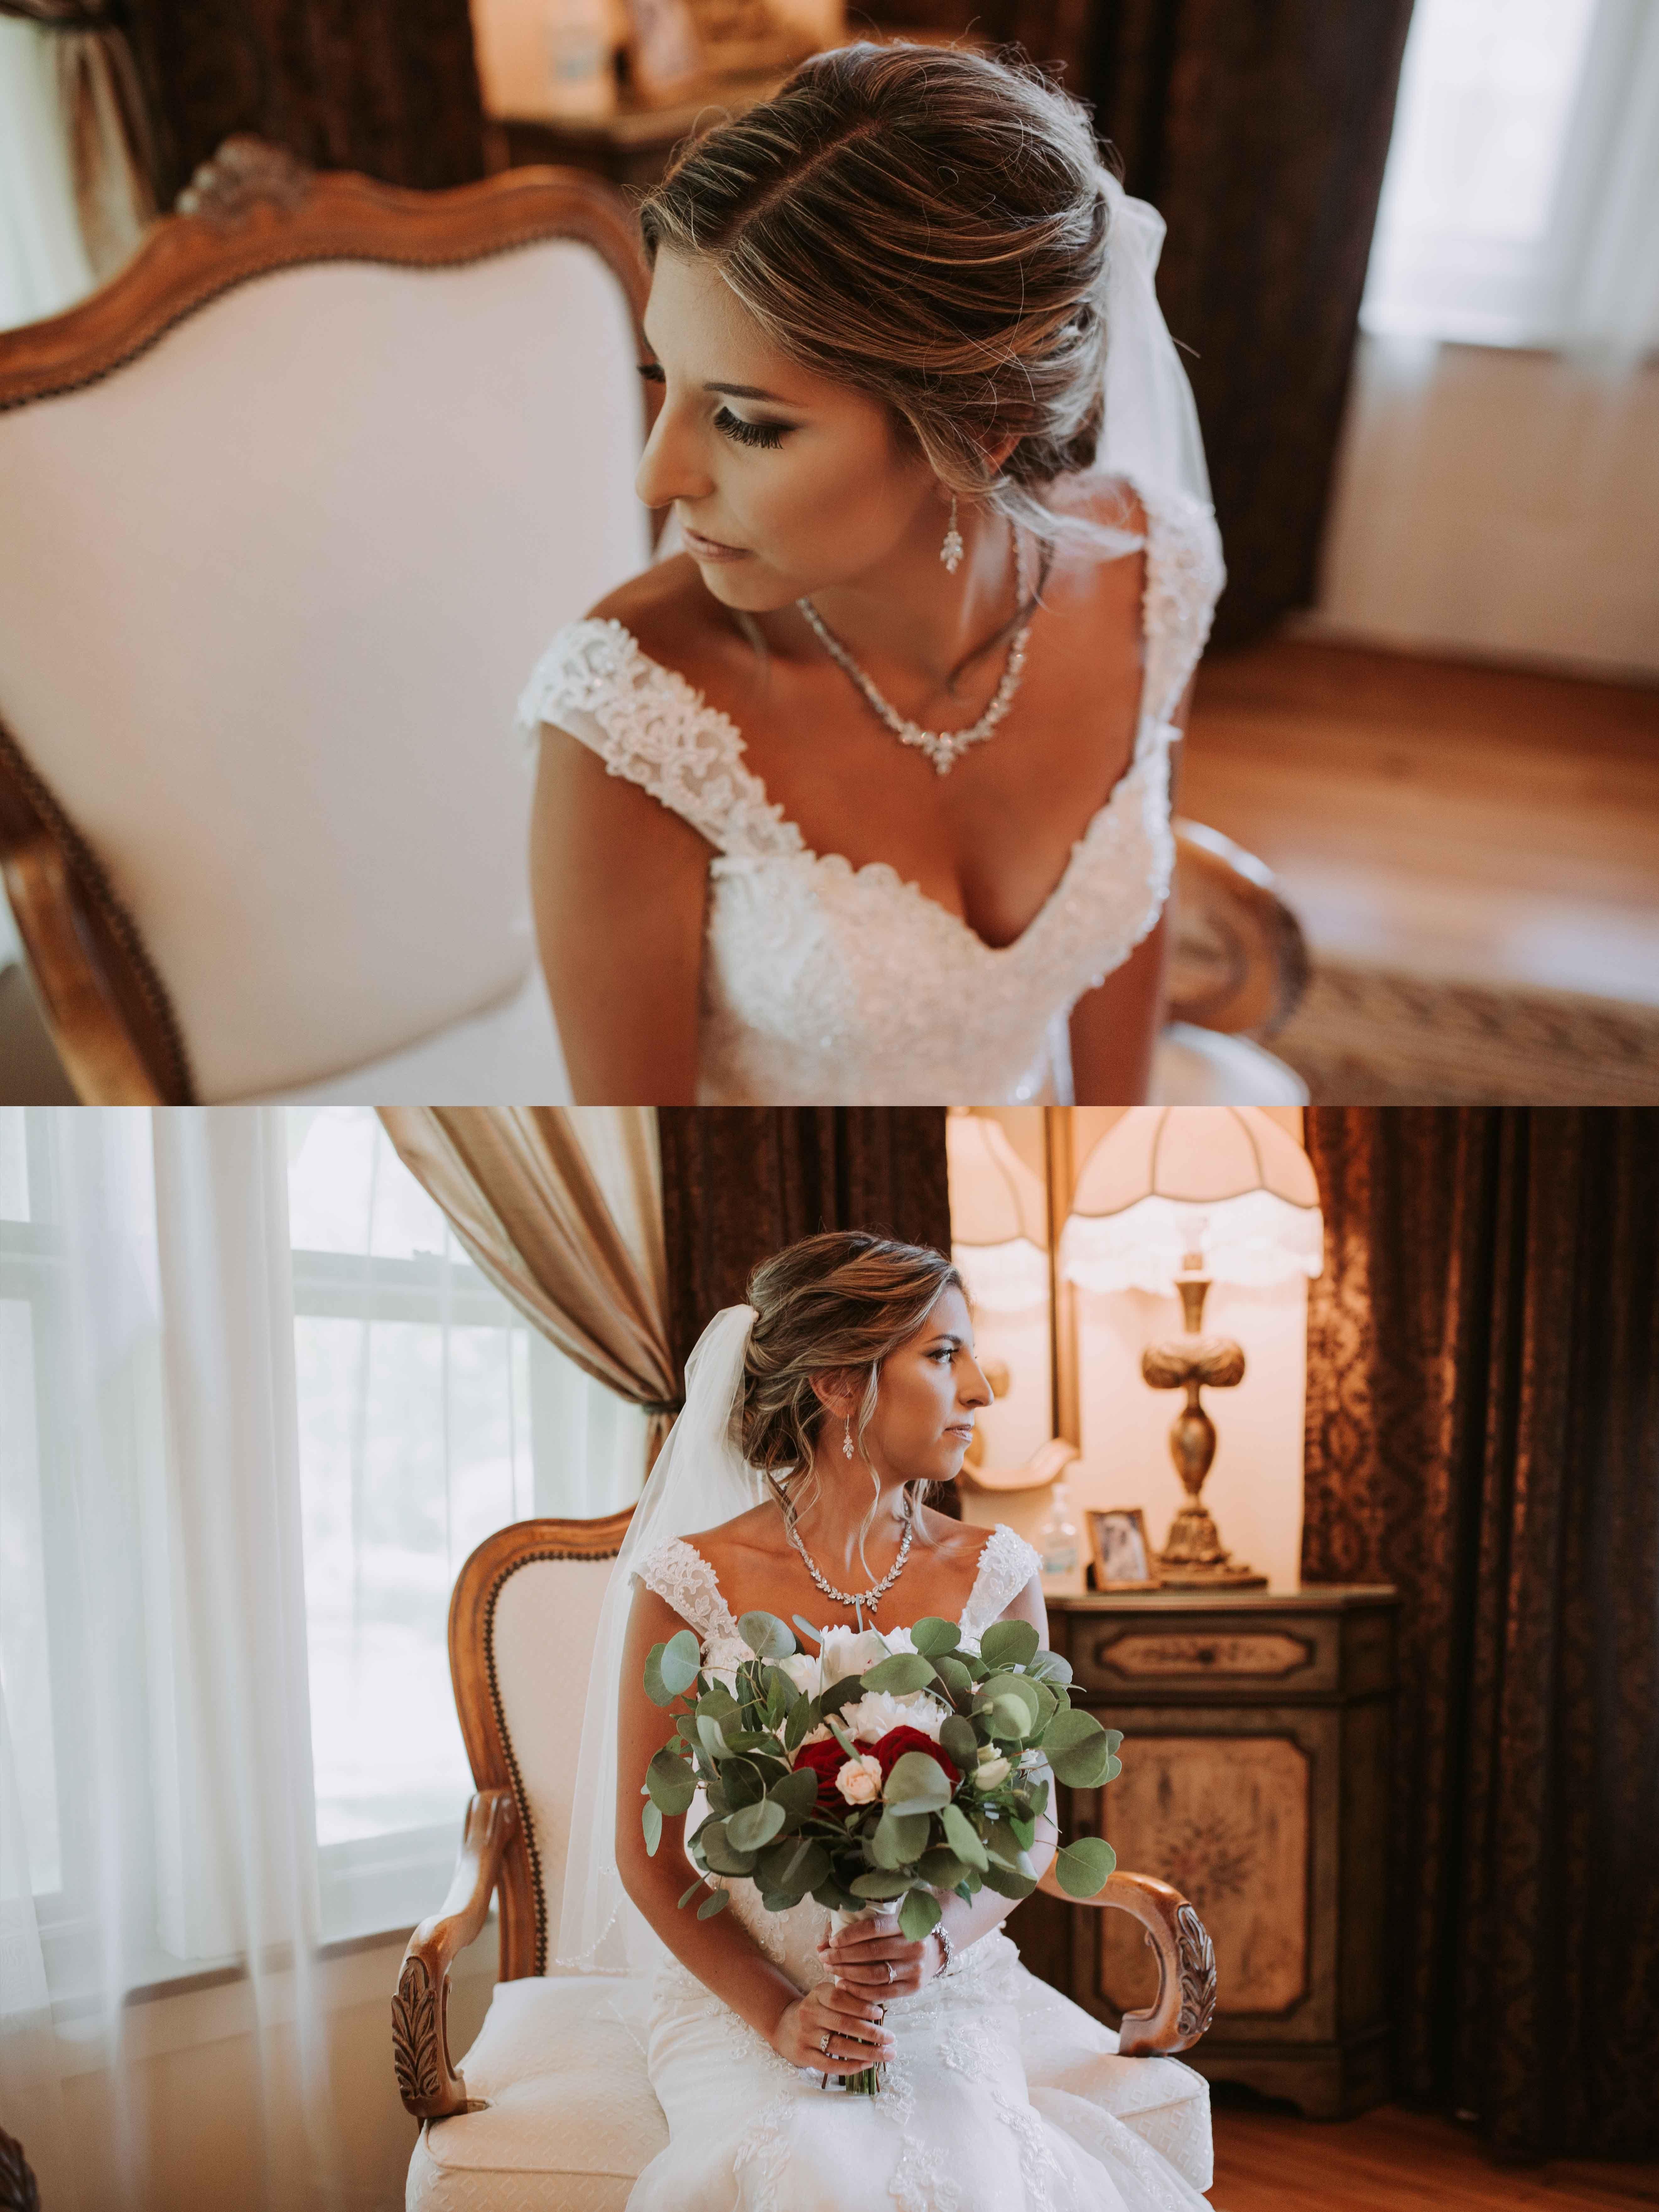 Bride getting ready, bride bouquet inspiration, bridal